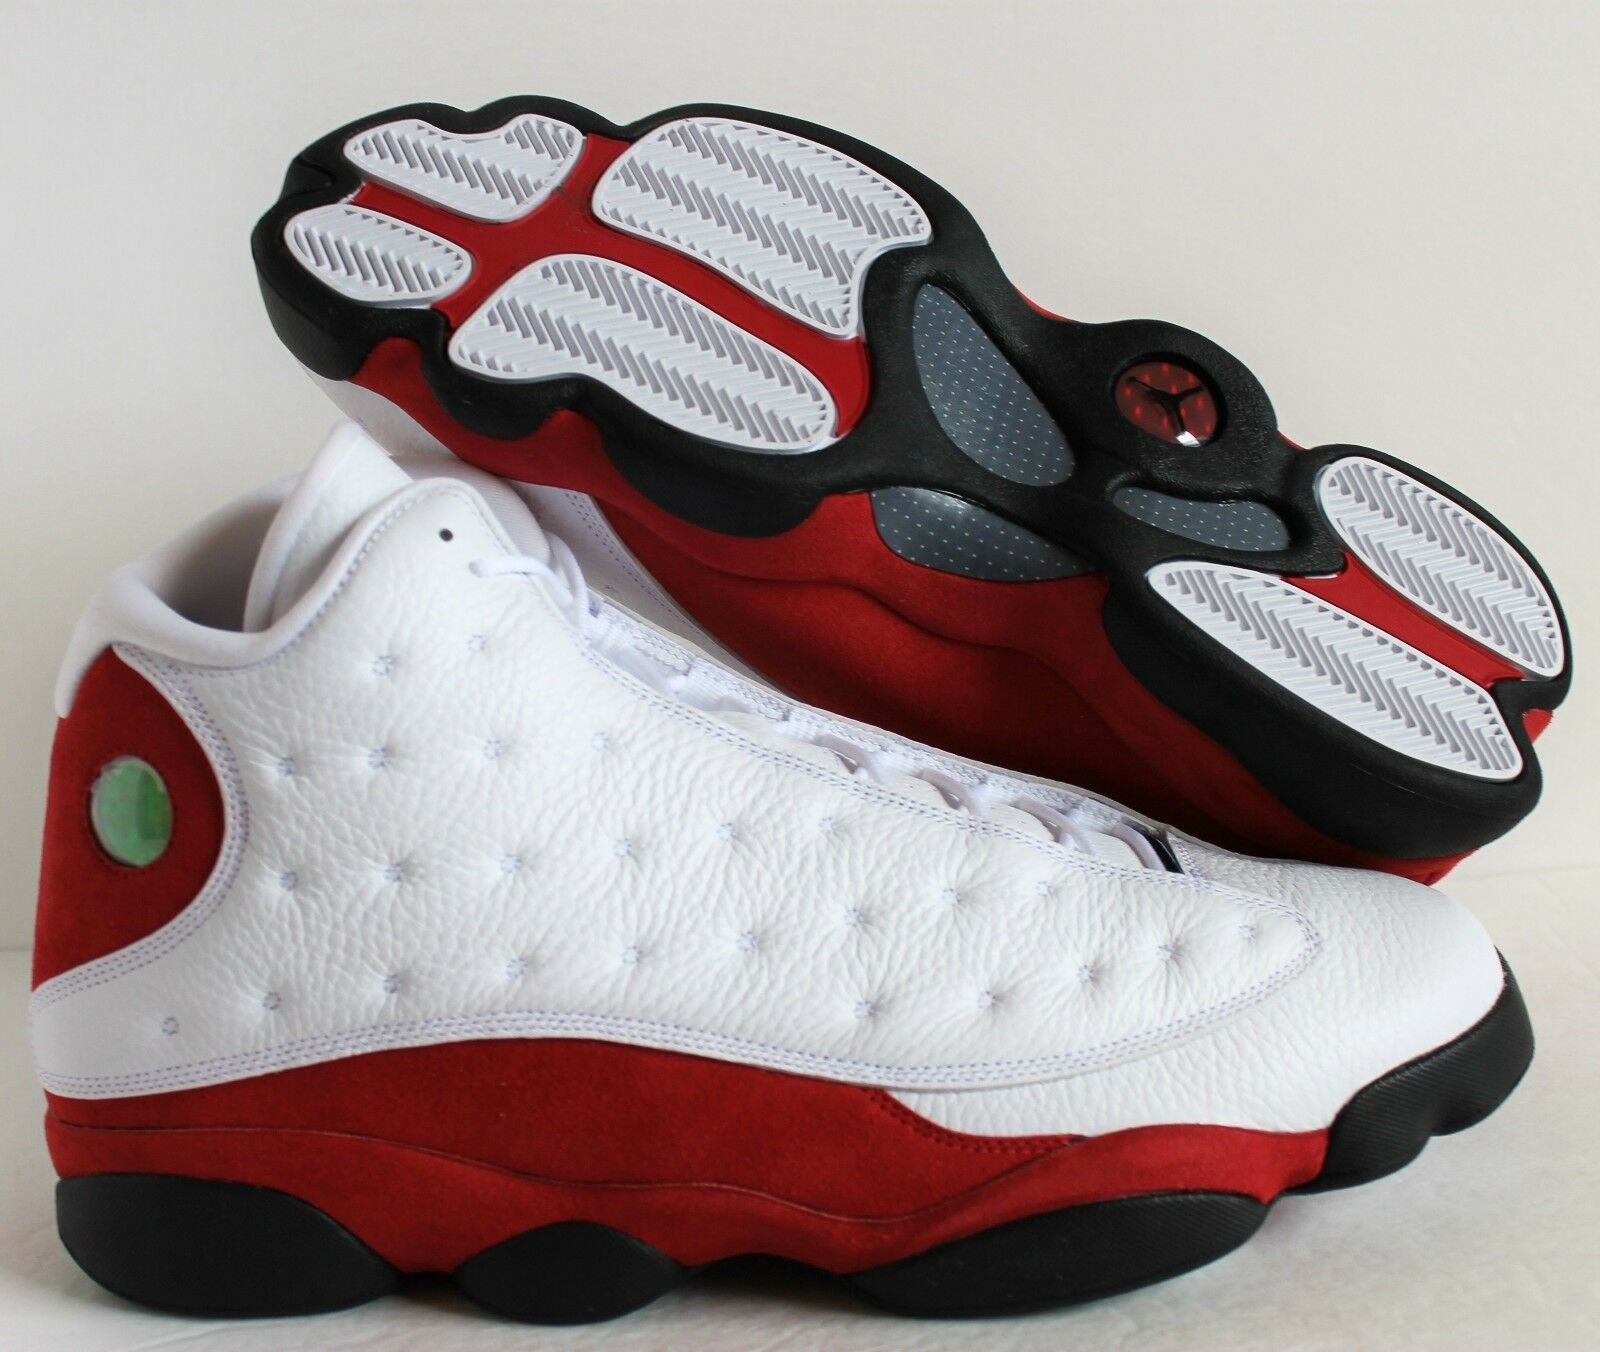 Nike air jordan 13 retrò chicago white-nero-team red sz 11 [414571-122]